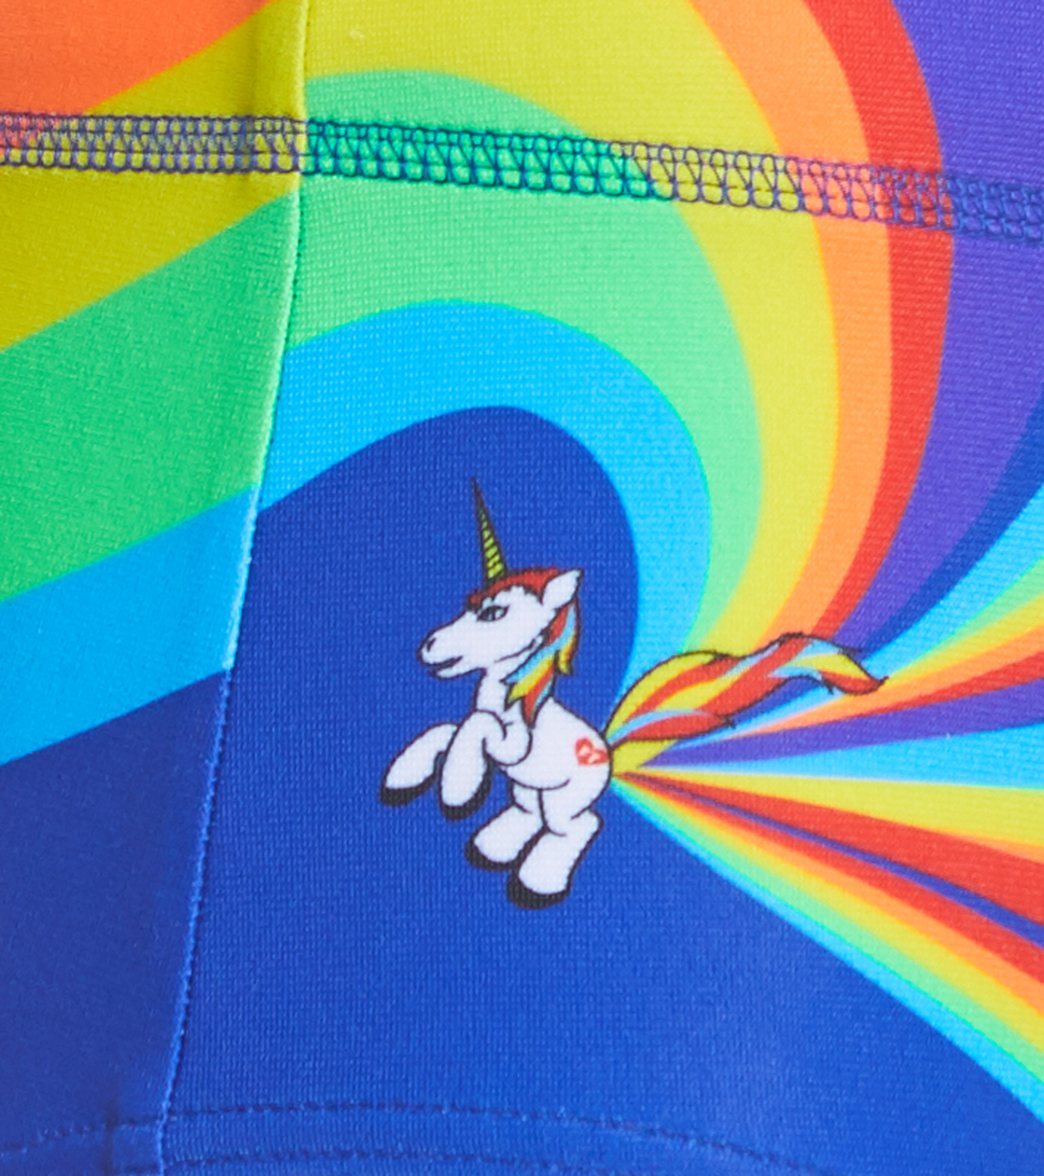 cedd5e8911 Funky Trunks Boys' Pony Puff Square Leg Swimsuit at SwimOutlet.com